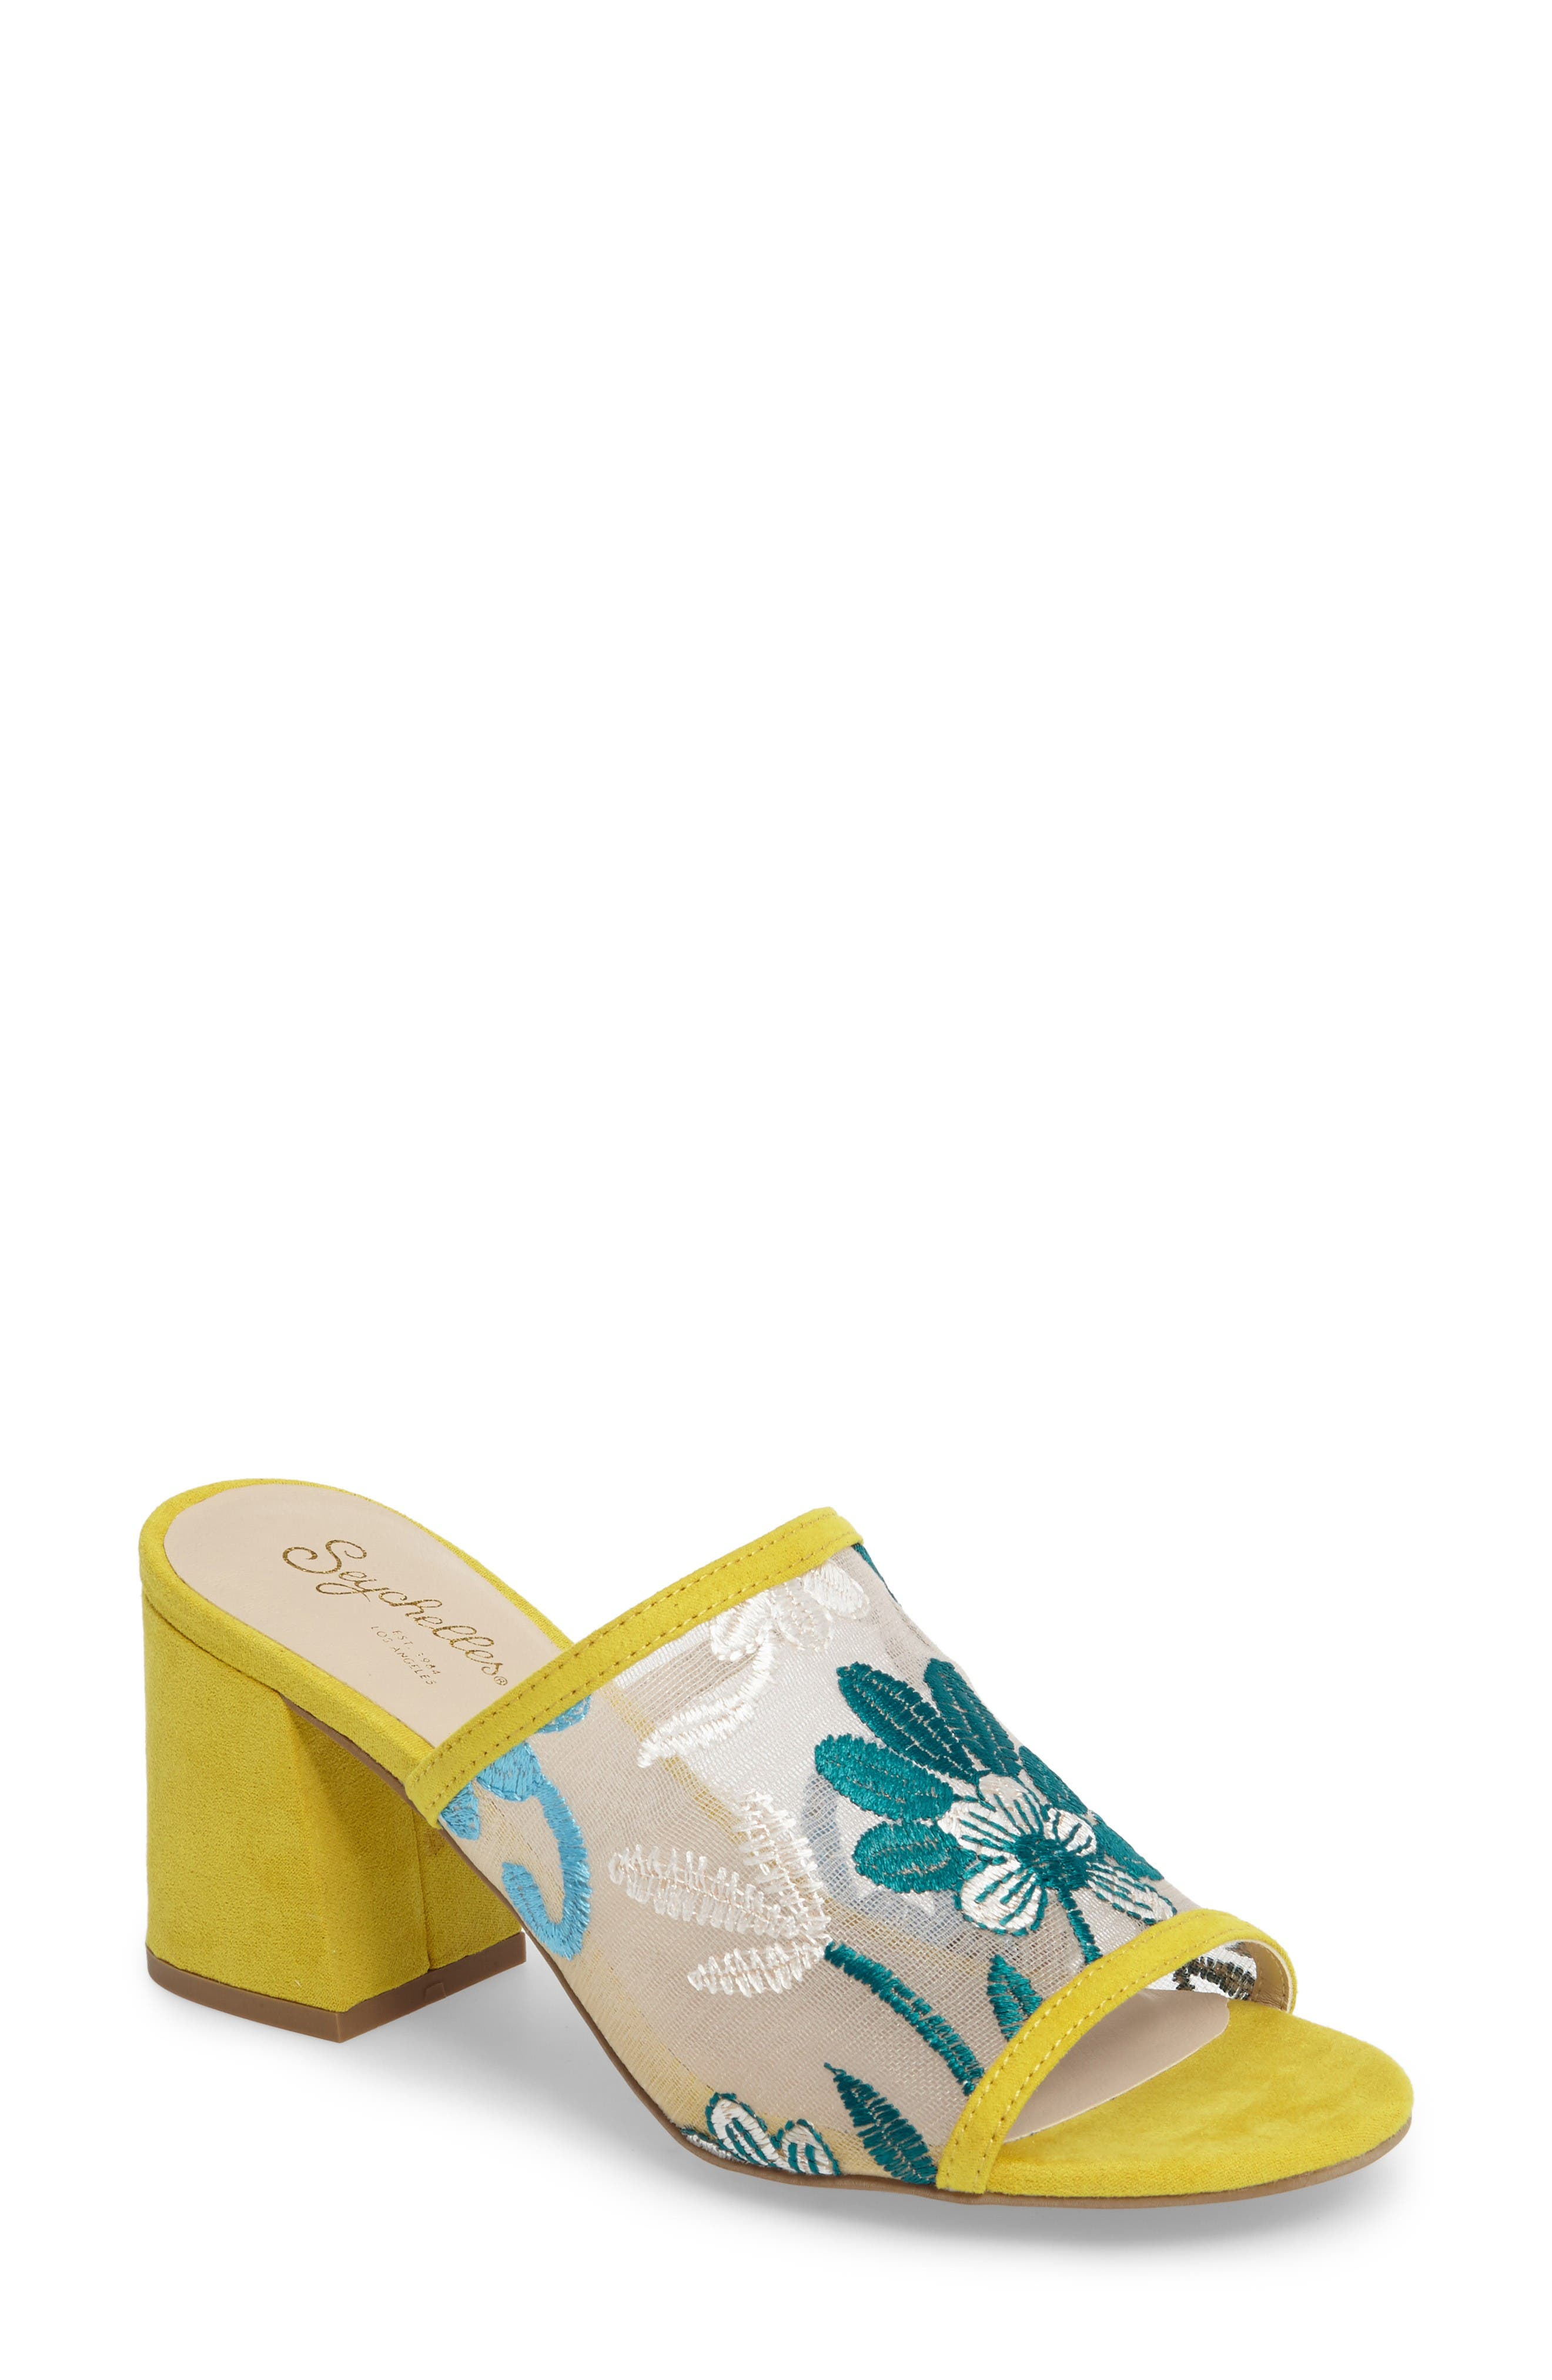 Nursery Block Heel Sandal,                             Main thumbnail 1, color,                             Yellow Suede